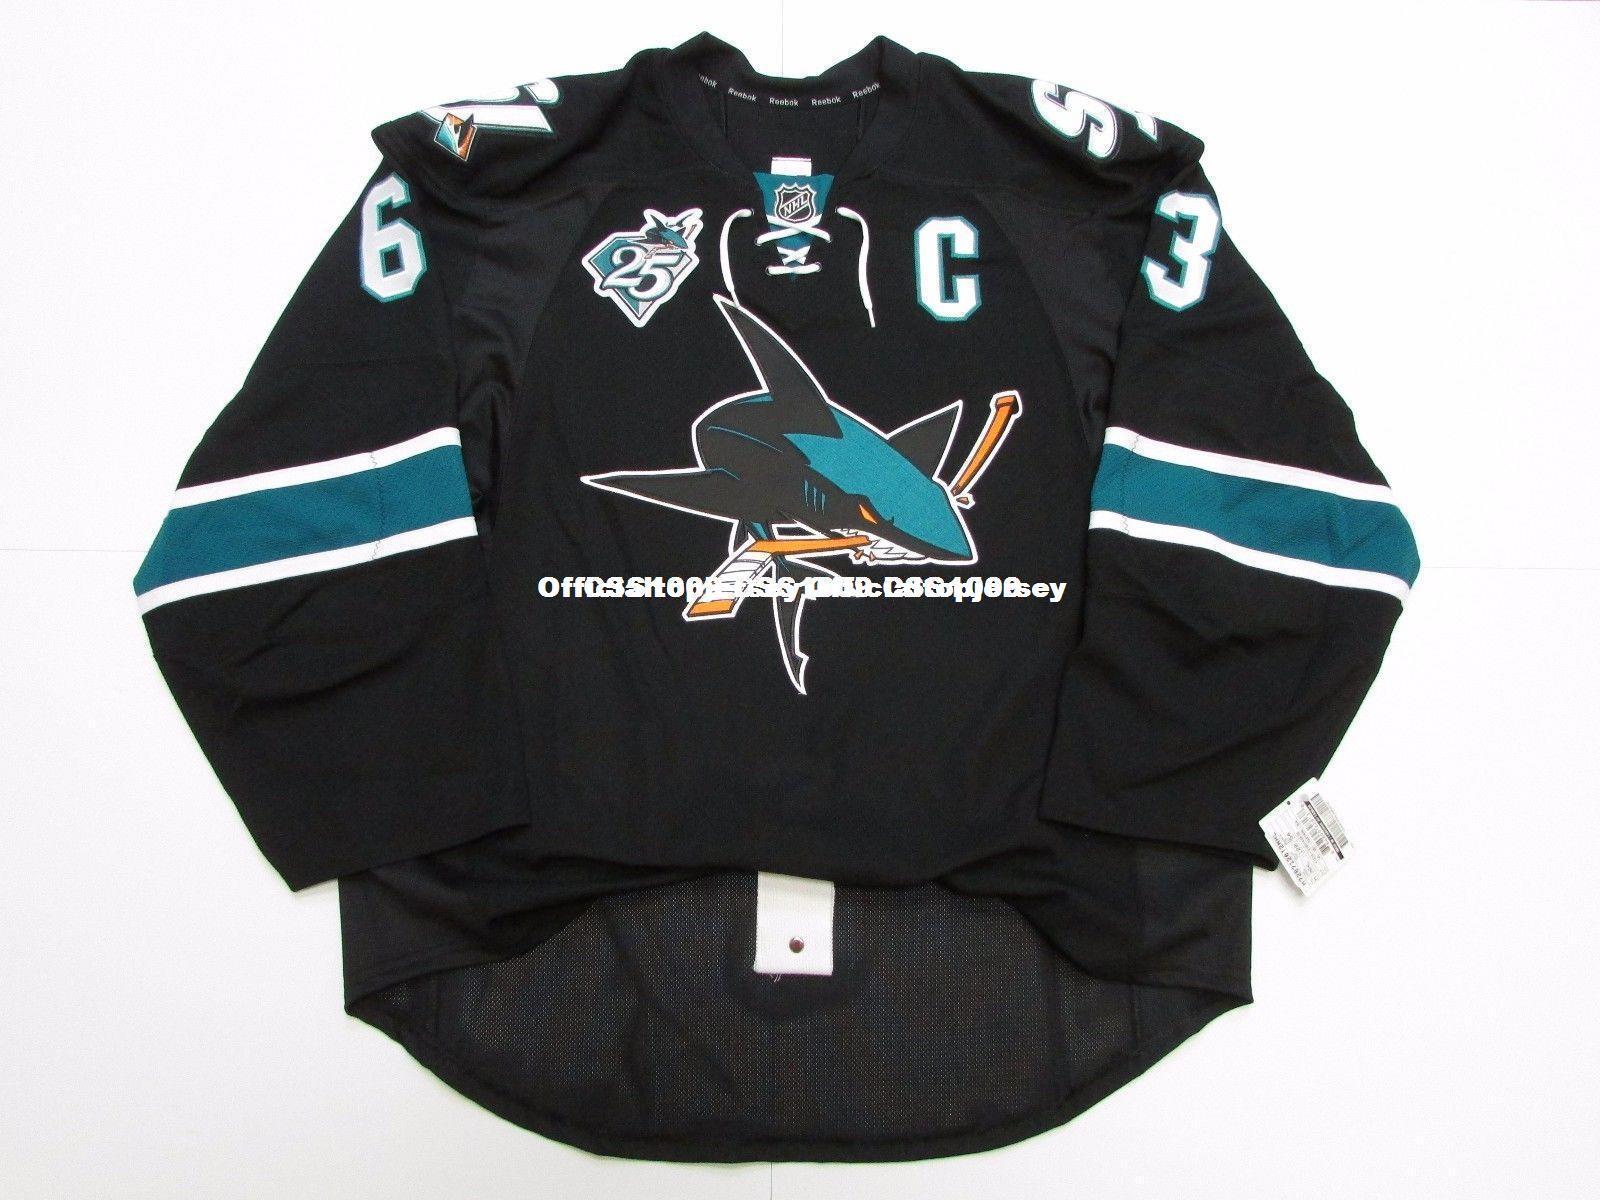 timeless design 13de8 42442 Cheap custom SAWYERS #63 SAN JOSE SHARKS THIRD 25th ANNIVERSARY JERSEY  stitch add any number any name Mens Hockey Jersey GOALIE CUT 5XL